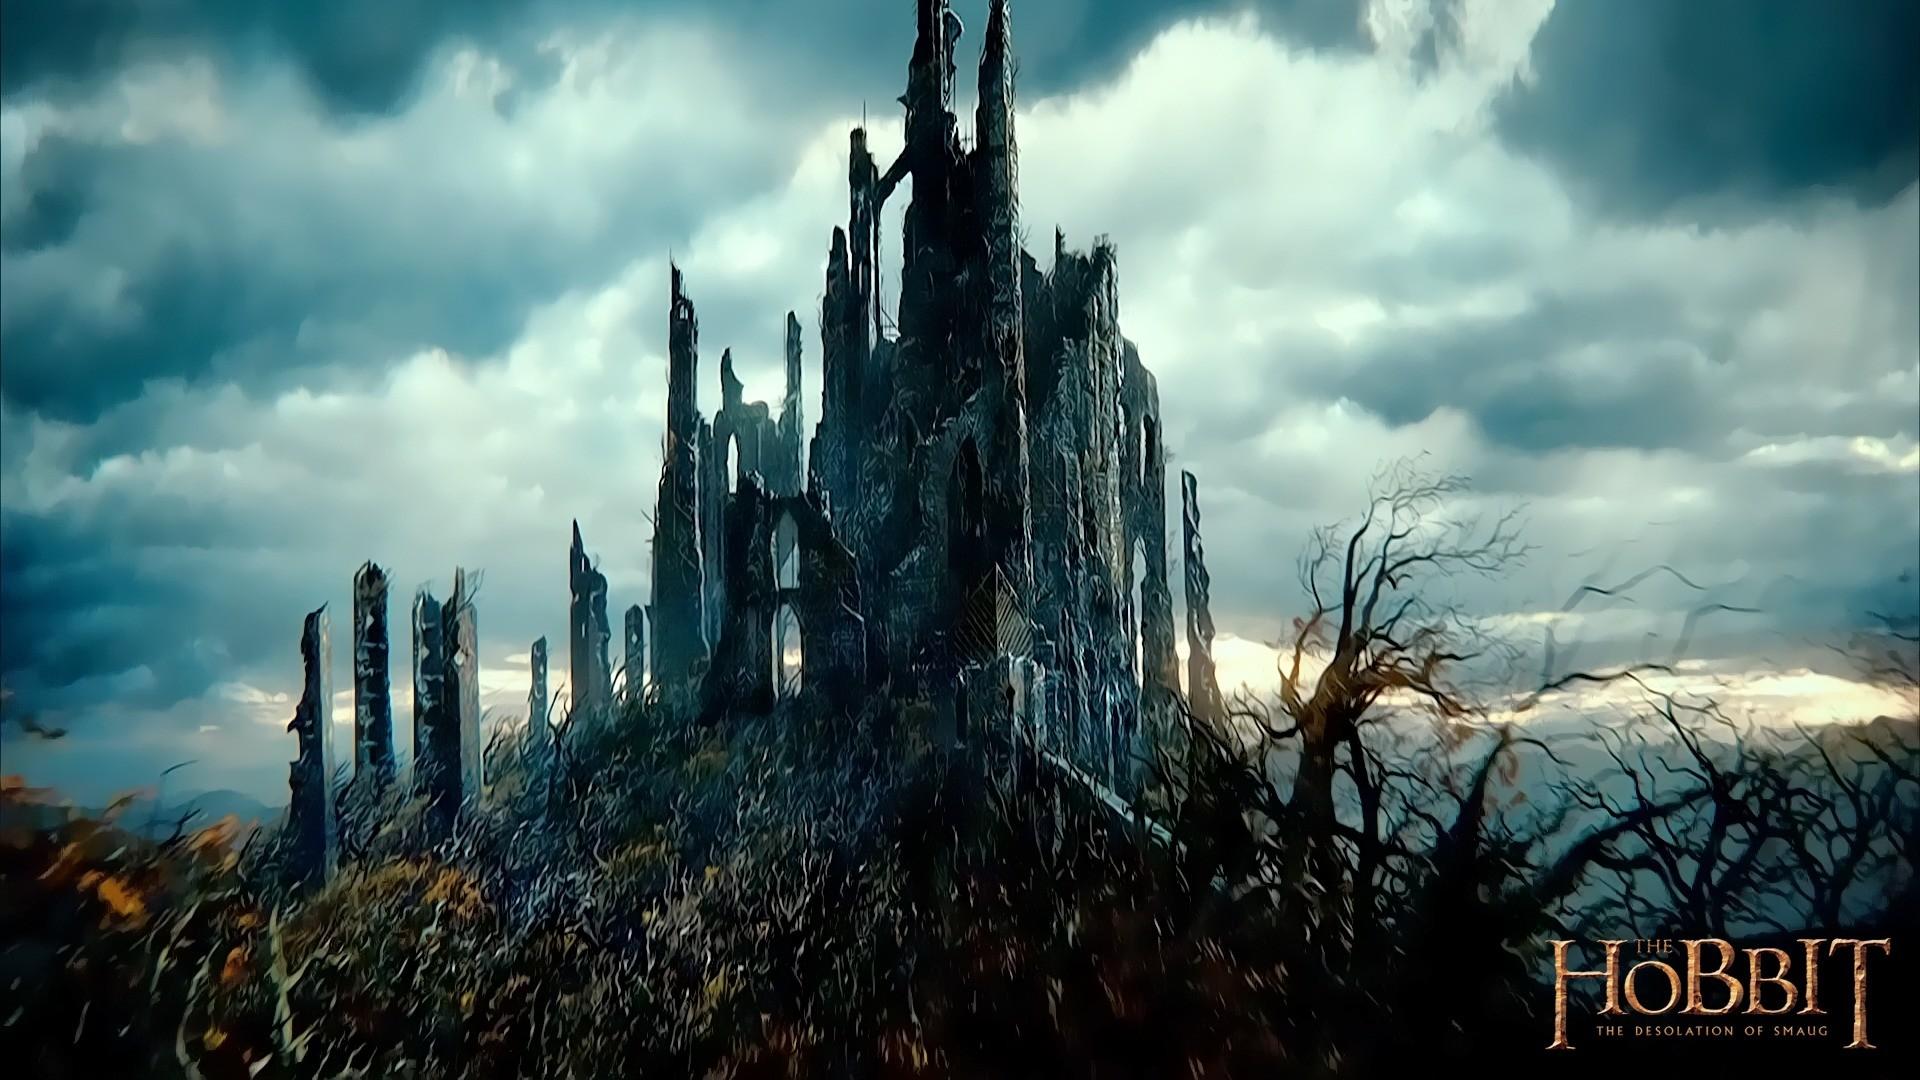 the hobbit wallpaper hd HD